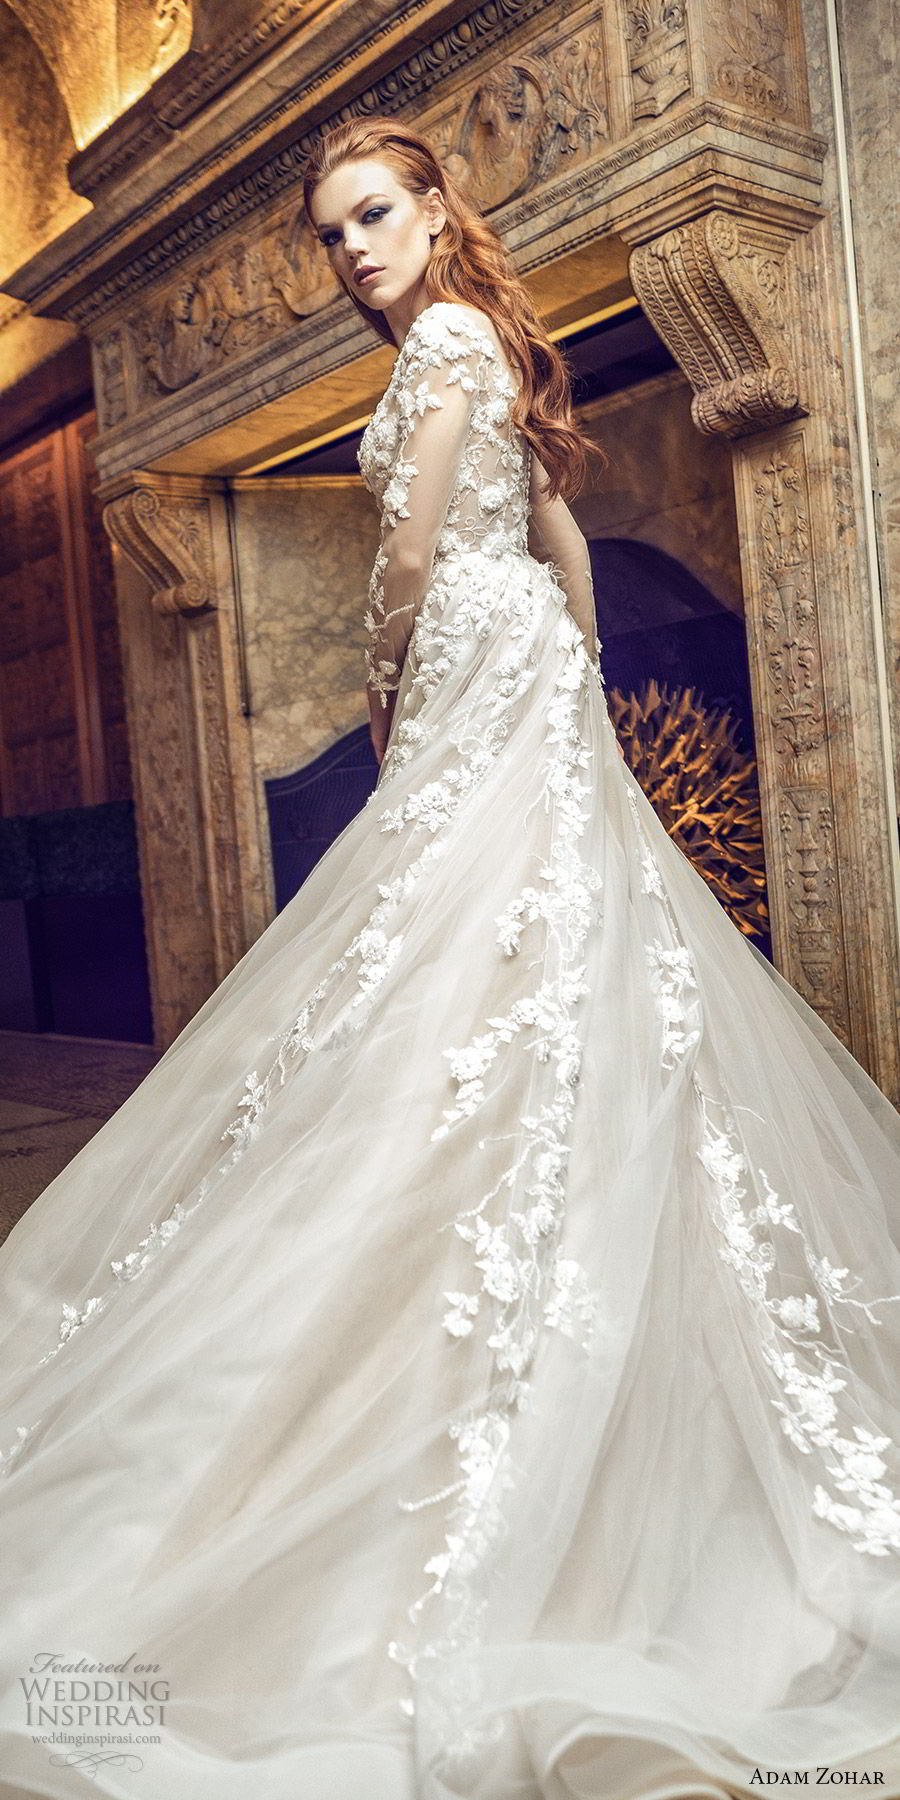 adam zohar 2020 bridal illusion long slseeves sweetheart neckline embellished bodice a line ball gown wedding dress (1) blush romantic elegant chapel train bv